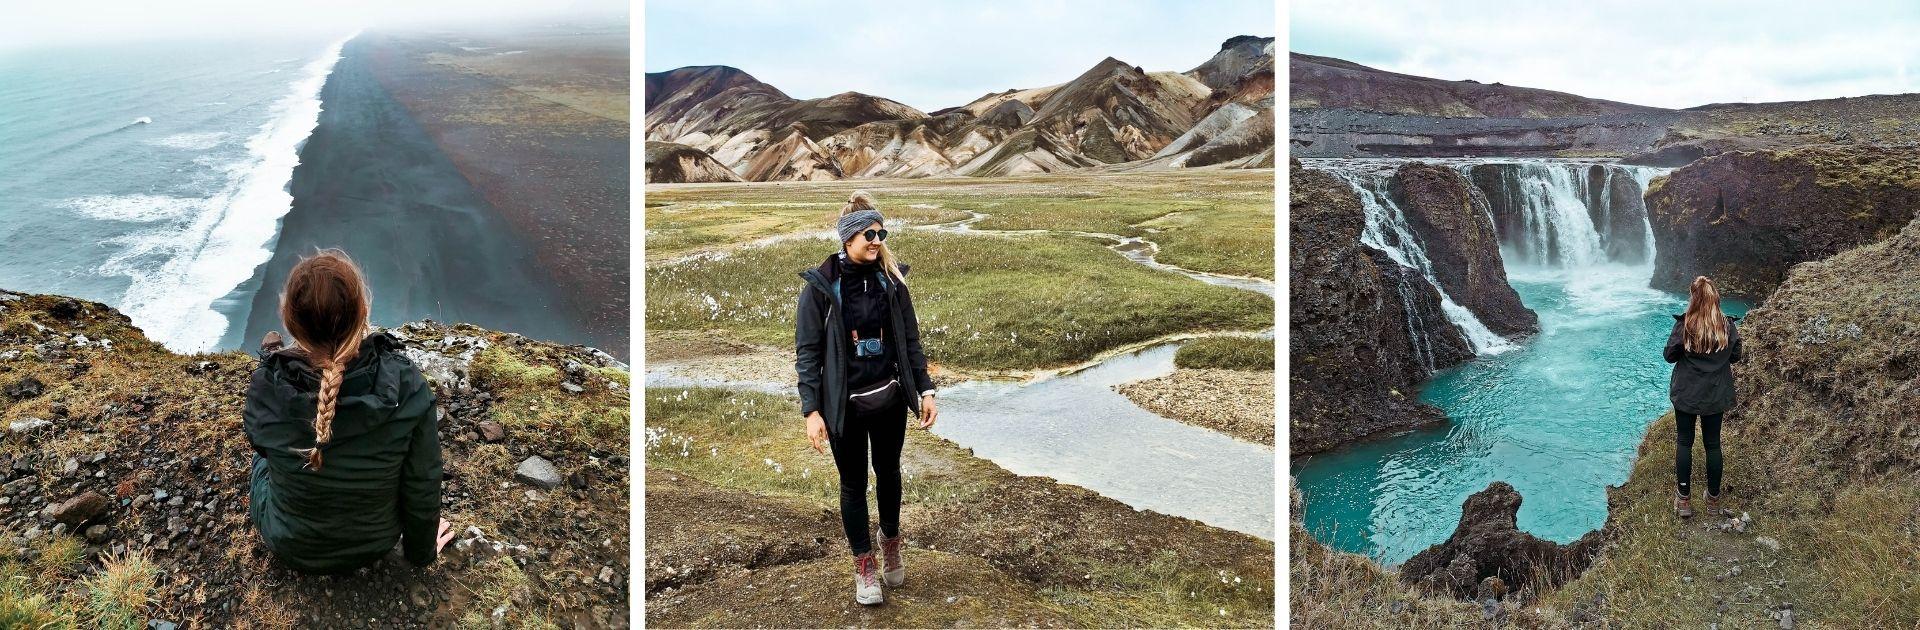 Islandia Salty Travels Blog